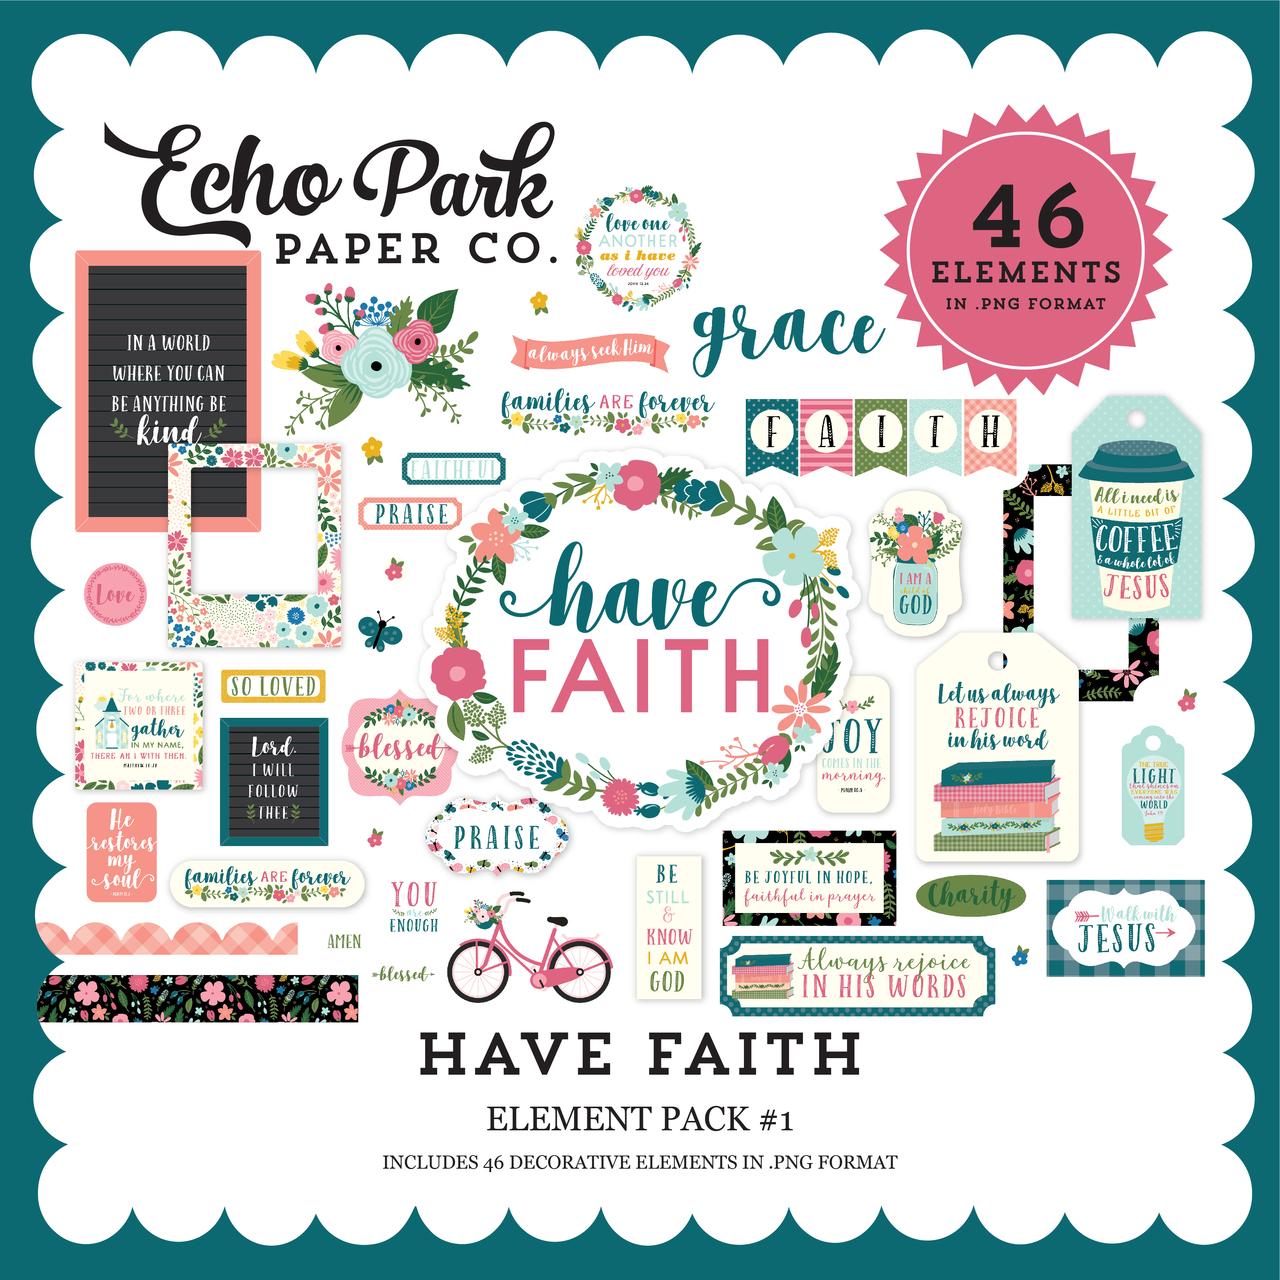 Have Faith Element Pack #1